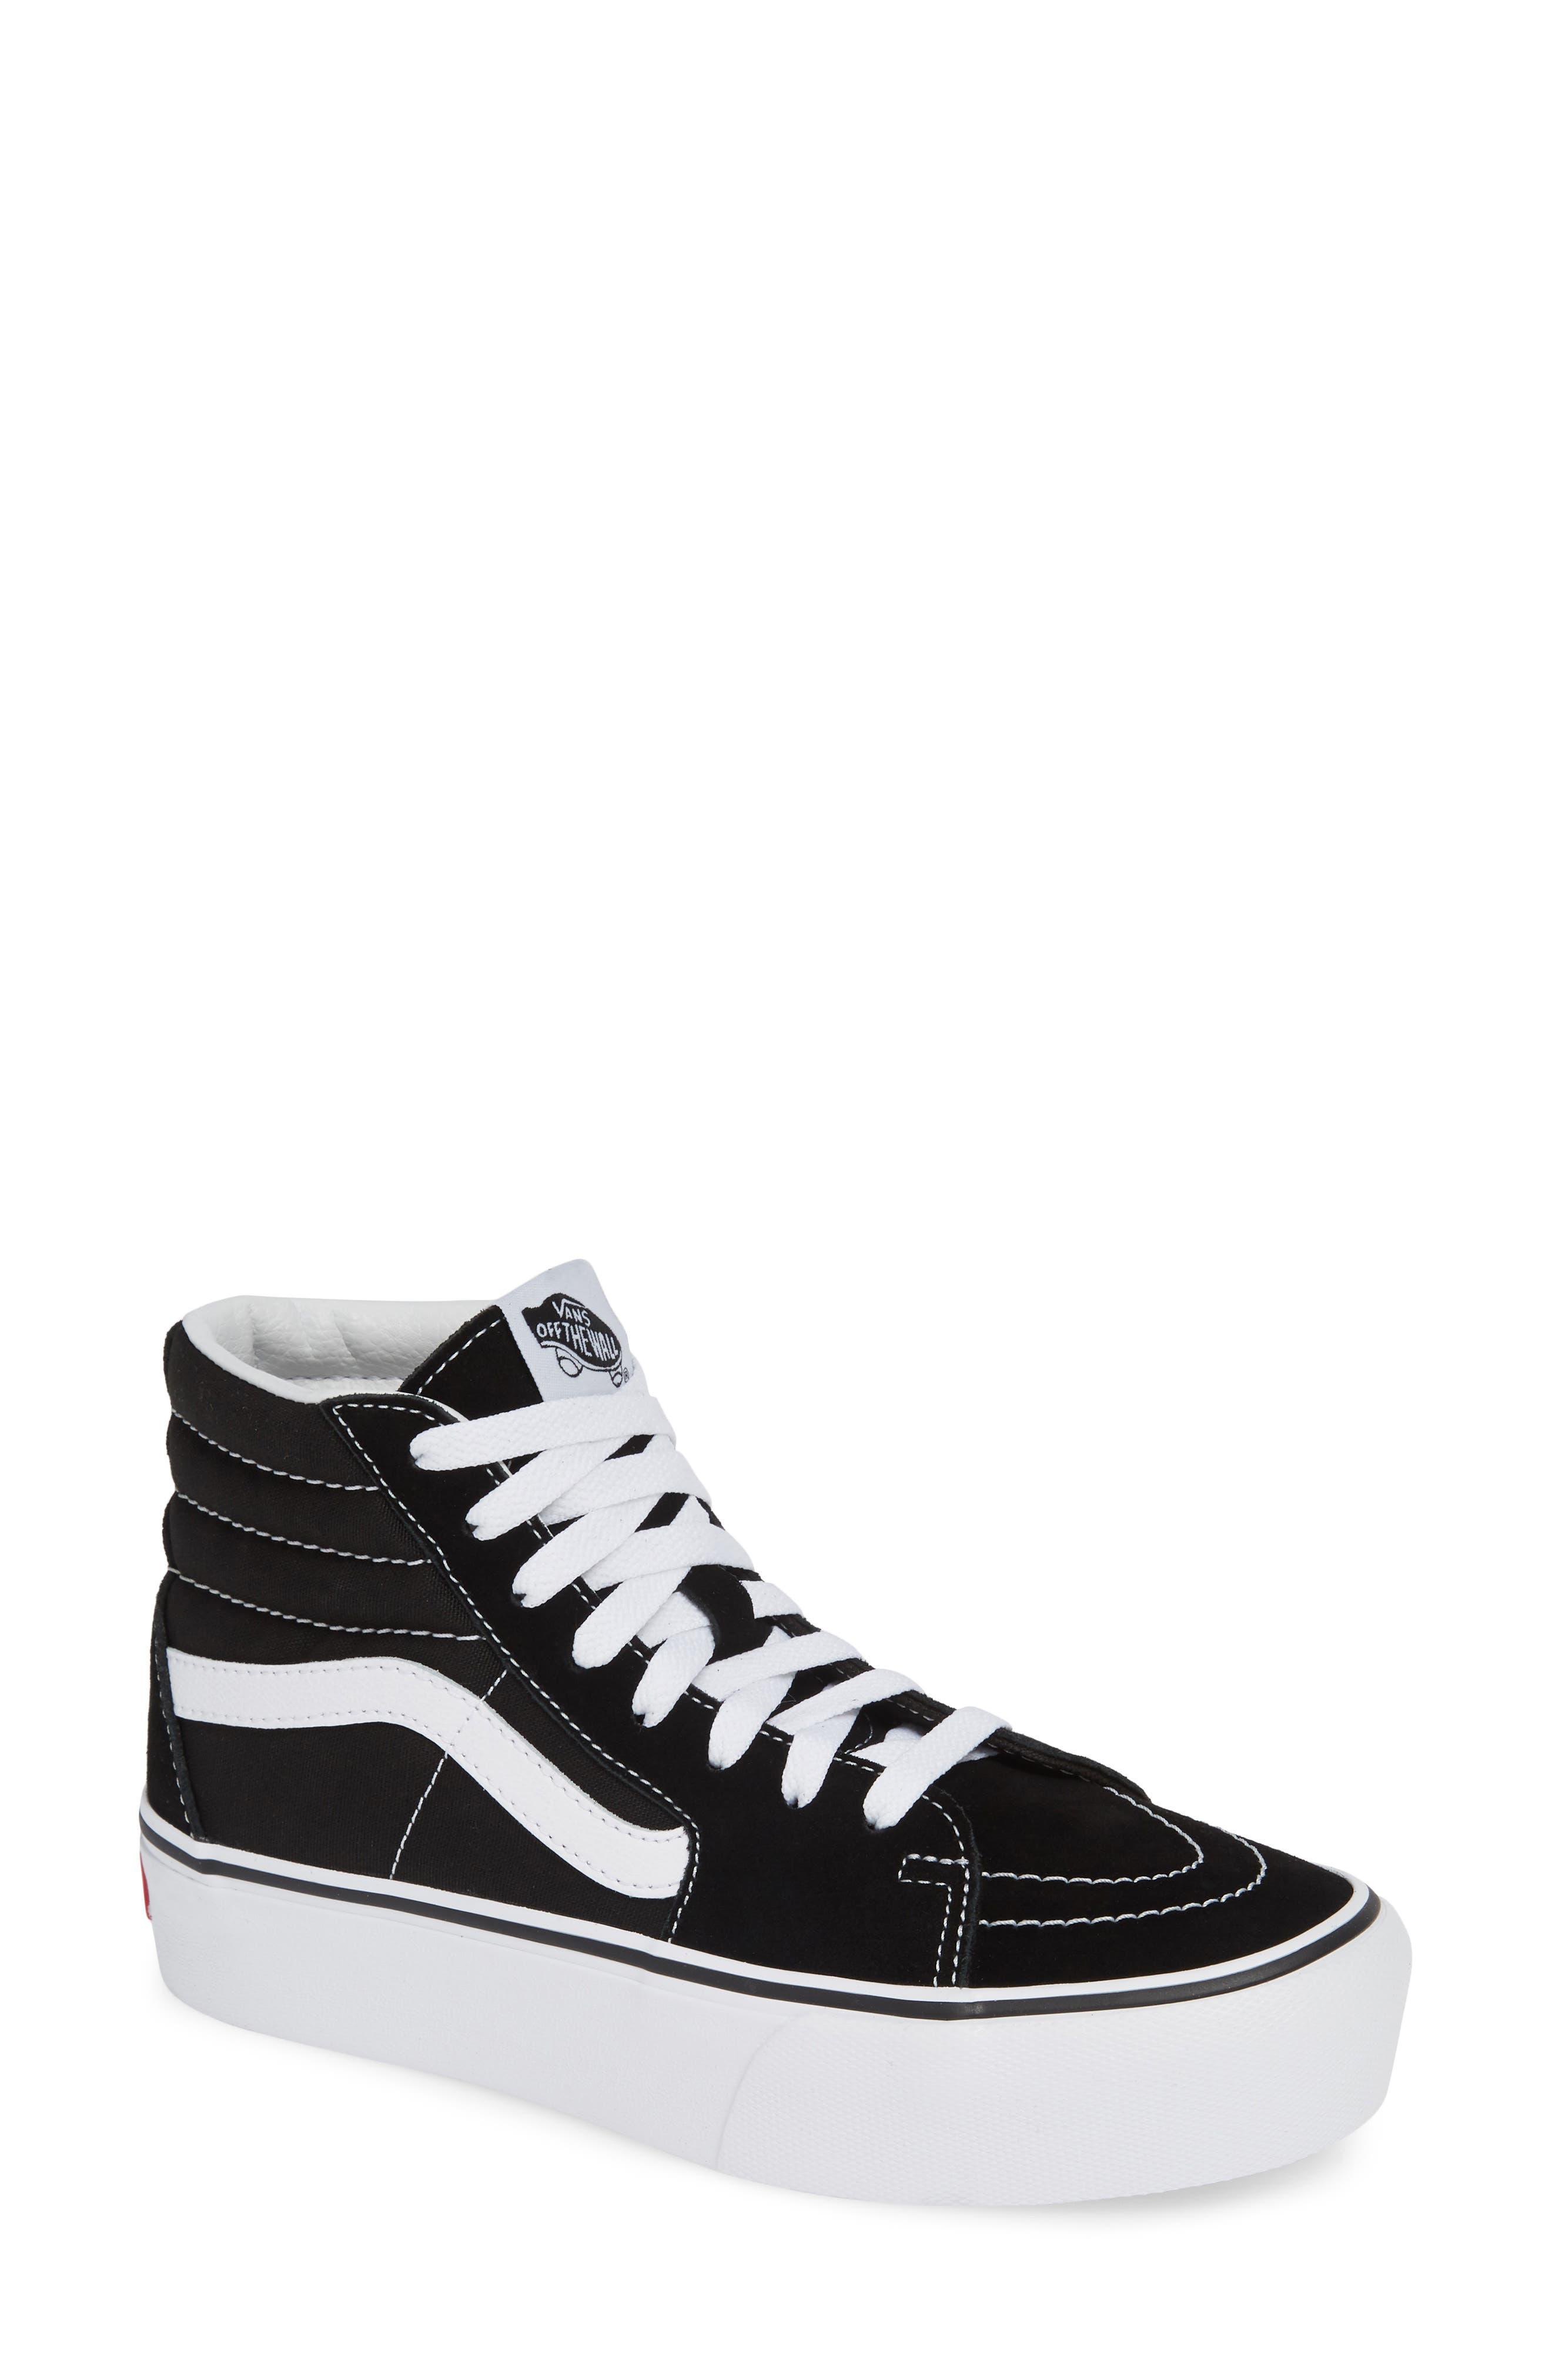 VANS Sk8-Hi Platform Sneaker, Main, color, BLACK/ TRUE WHITE